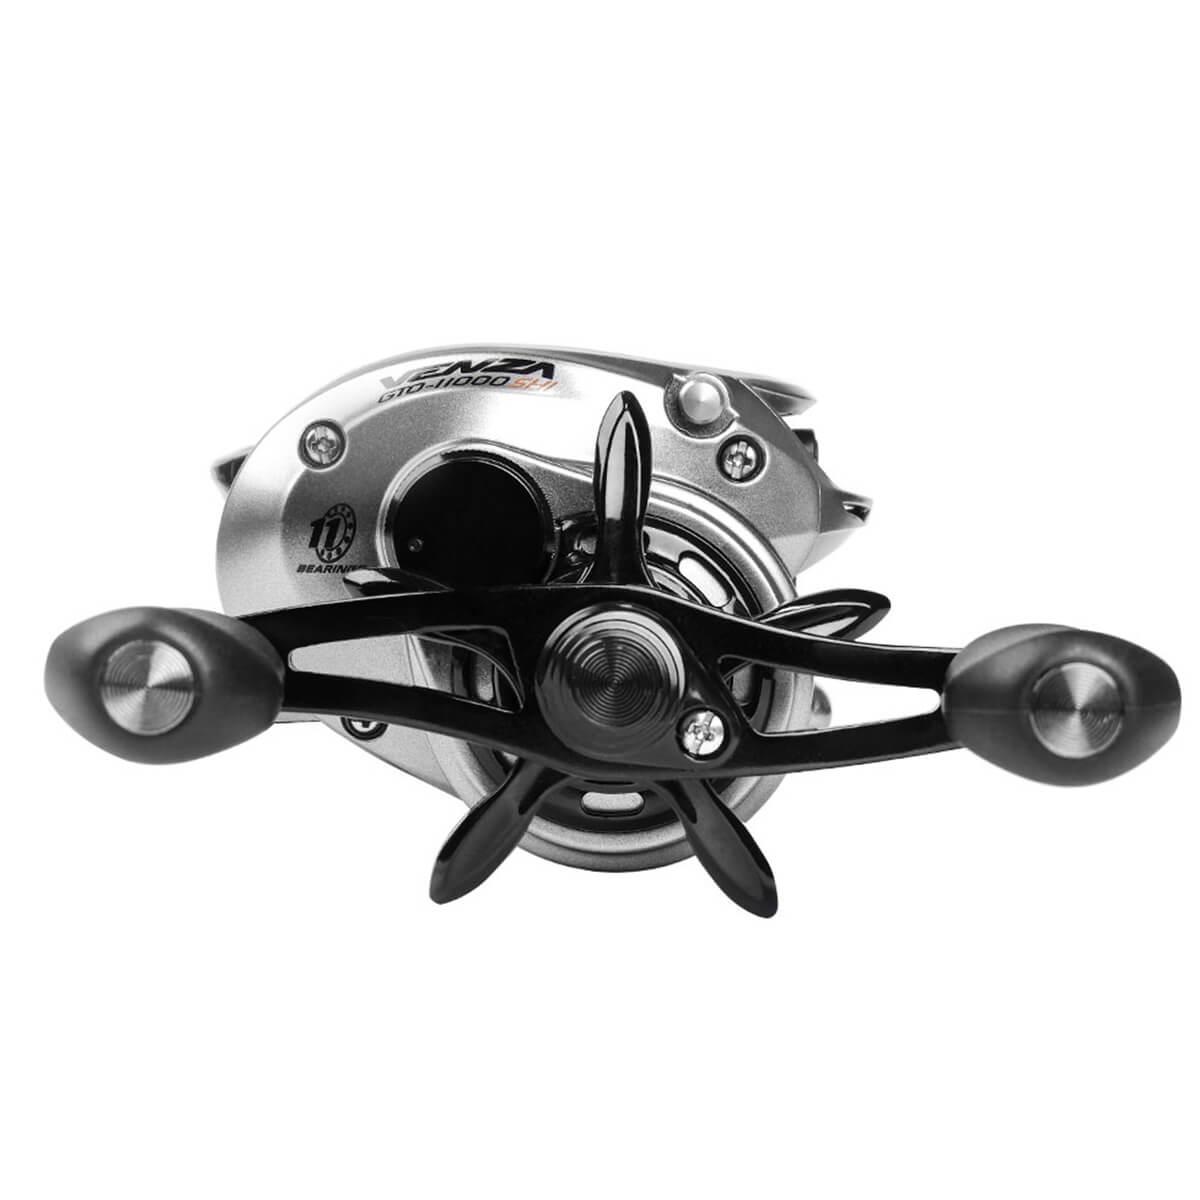 Carretilha Marine Sports Venza GTO 11000 SHI/SHIL 7.3:1 11 Rolamentos